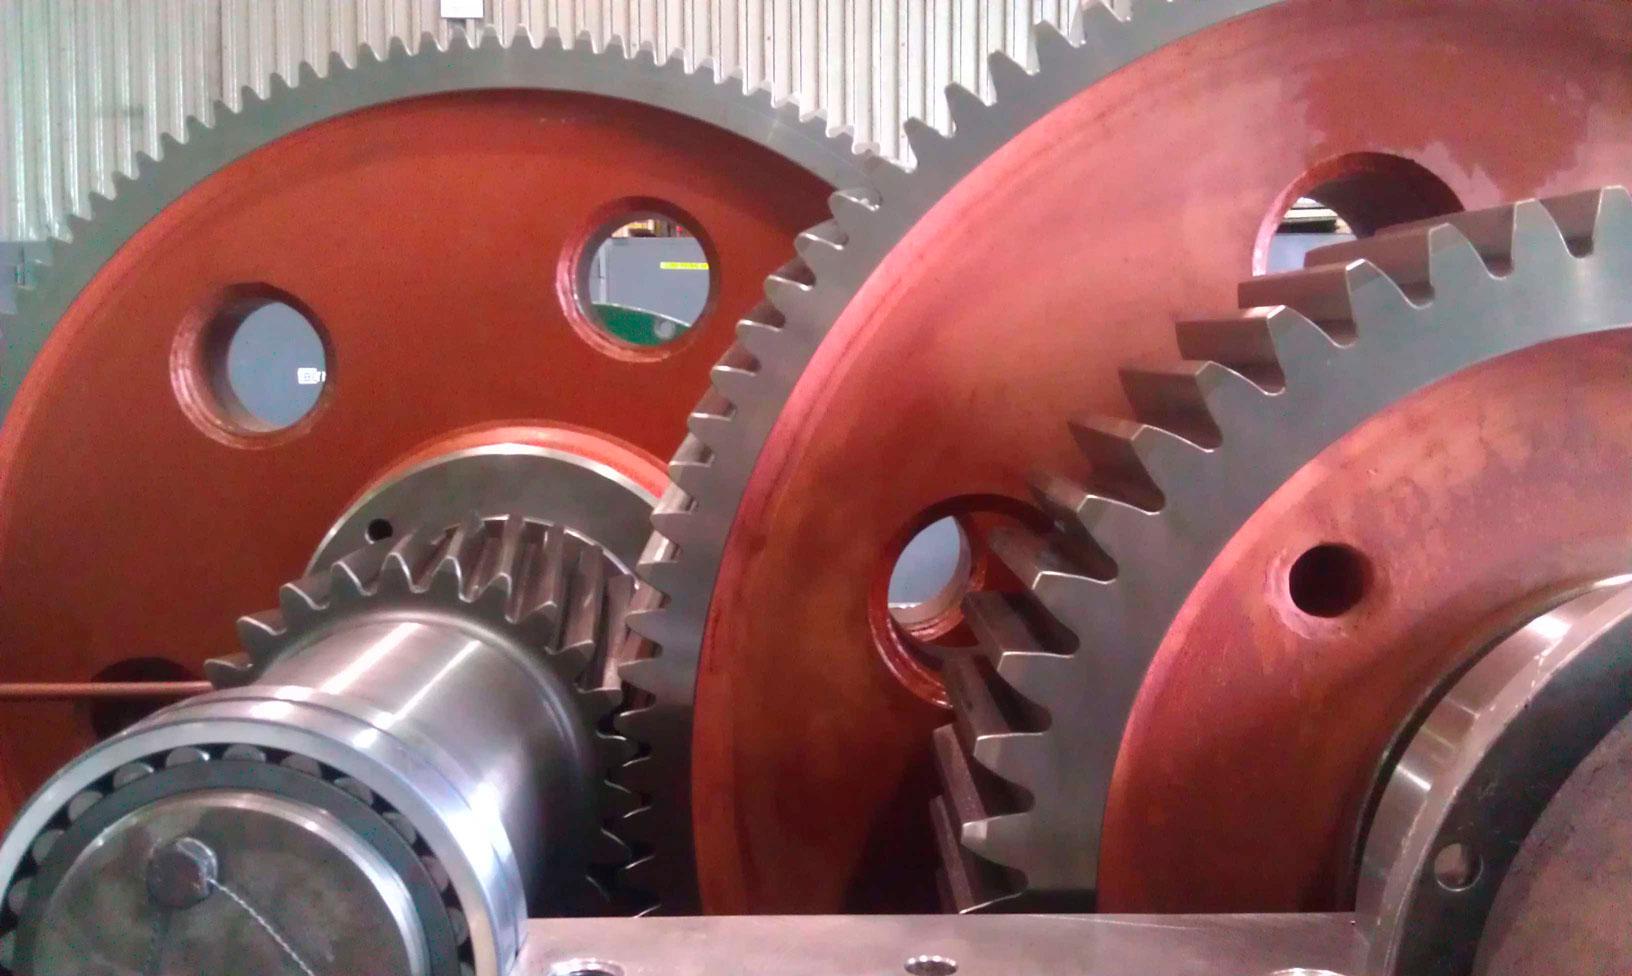 Gear box for rotary shear at Nucor